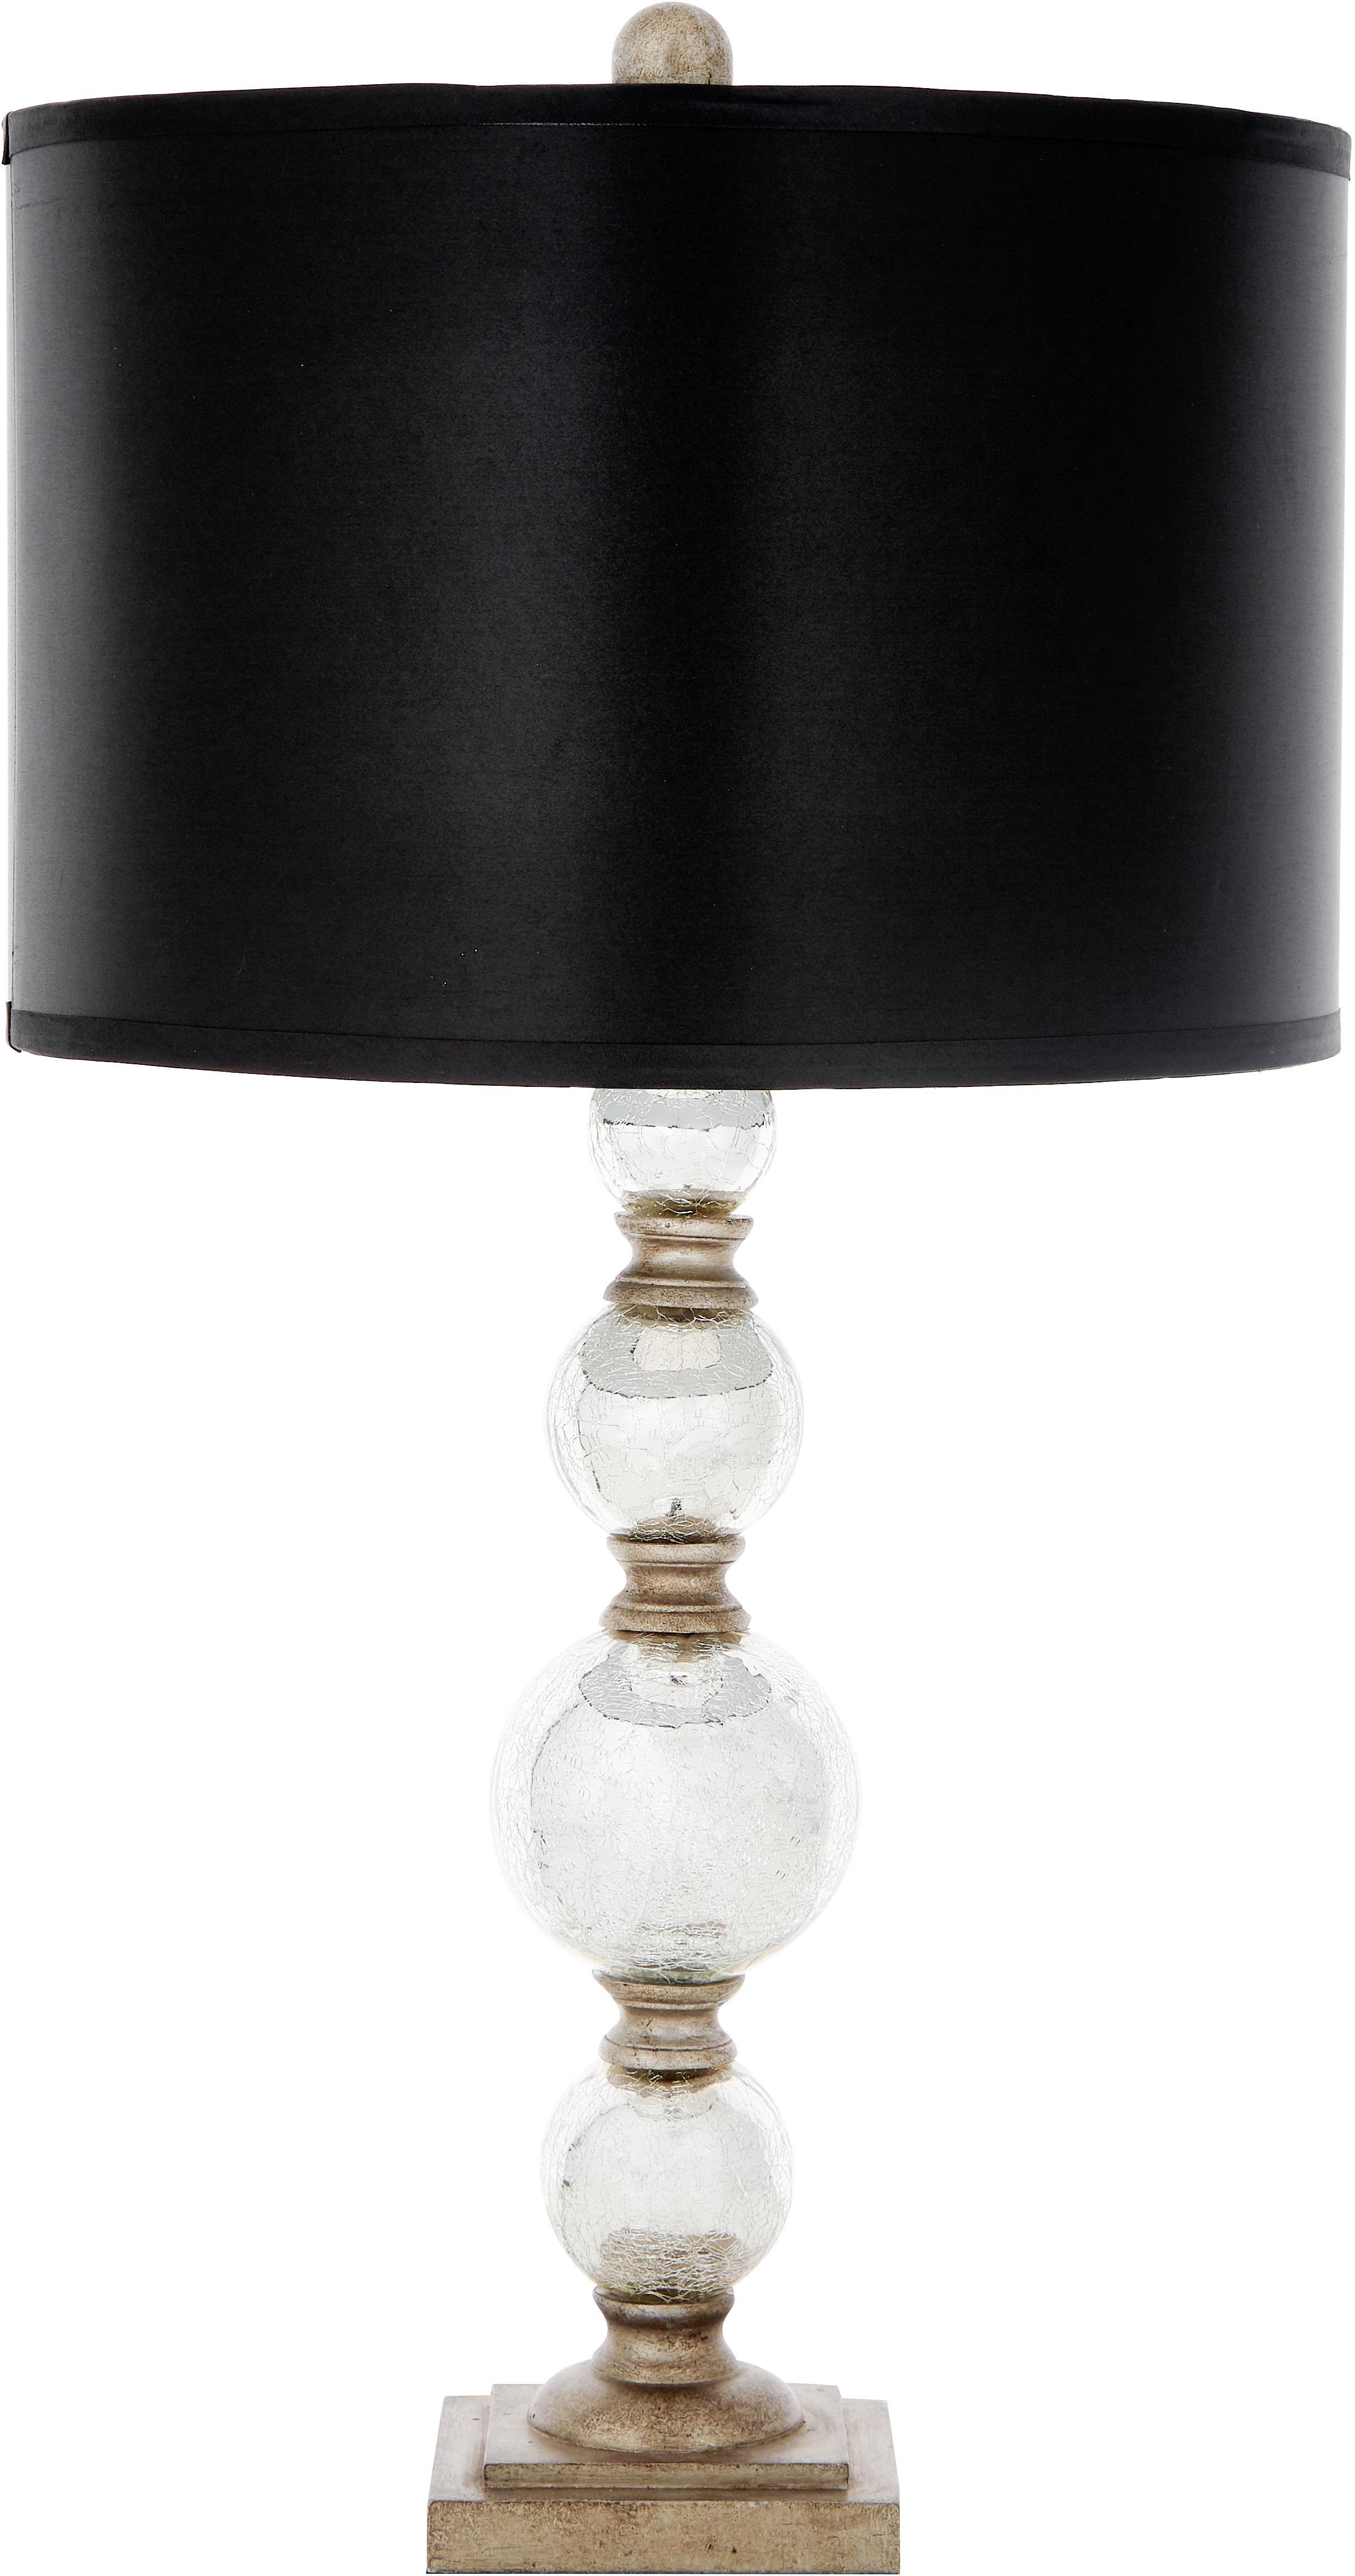 Grosse Tischlampen Balls, 2 Stück, Lampenschirm: Textil (Polyesterbezug), Schwarz,Silber, Ø 35 x H 75 cm